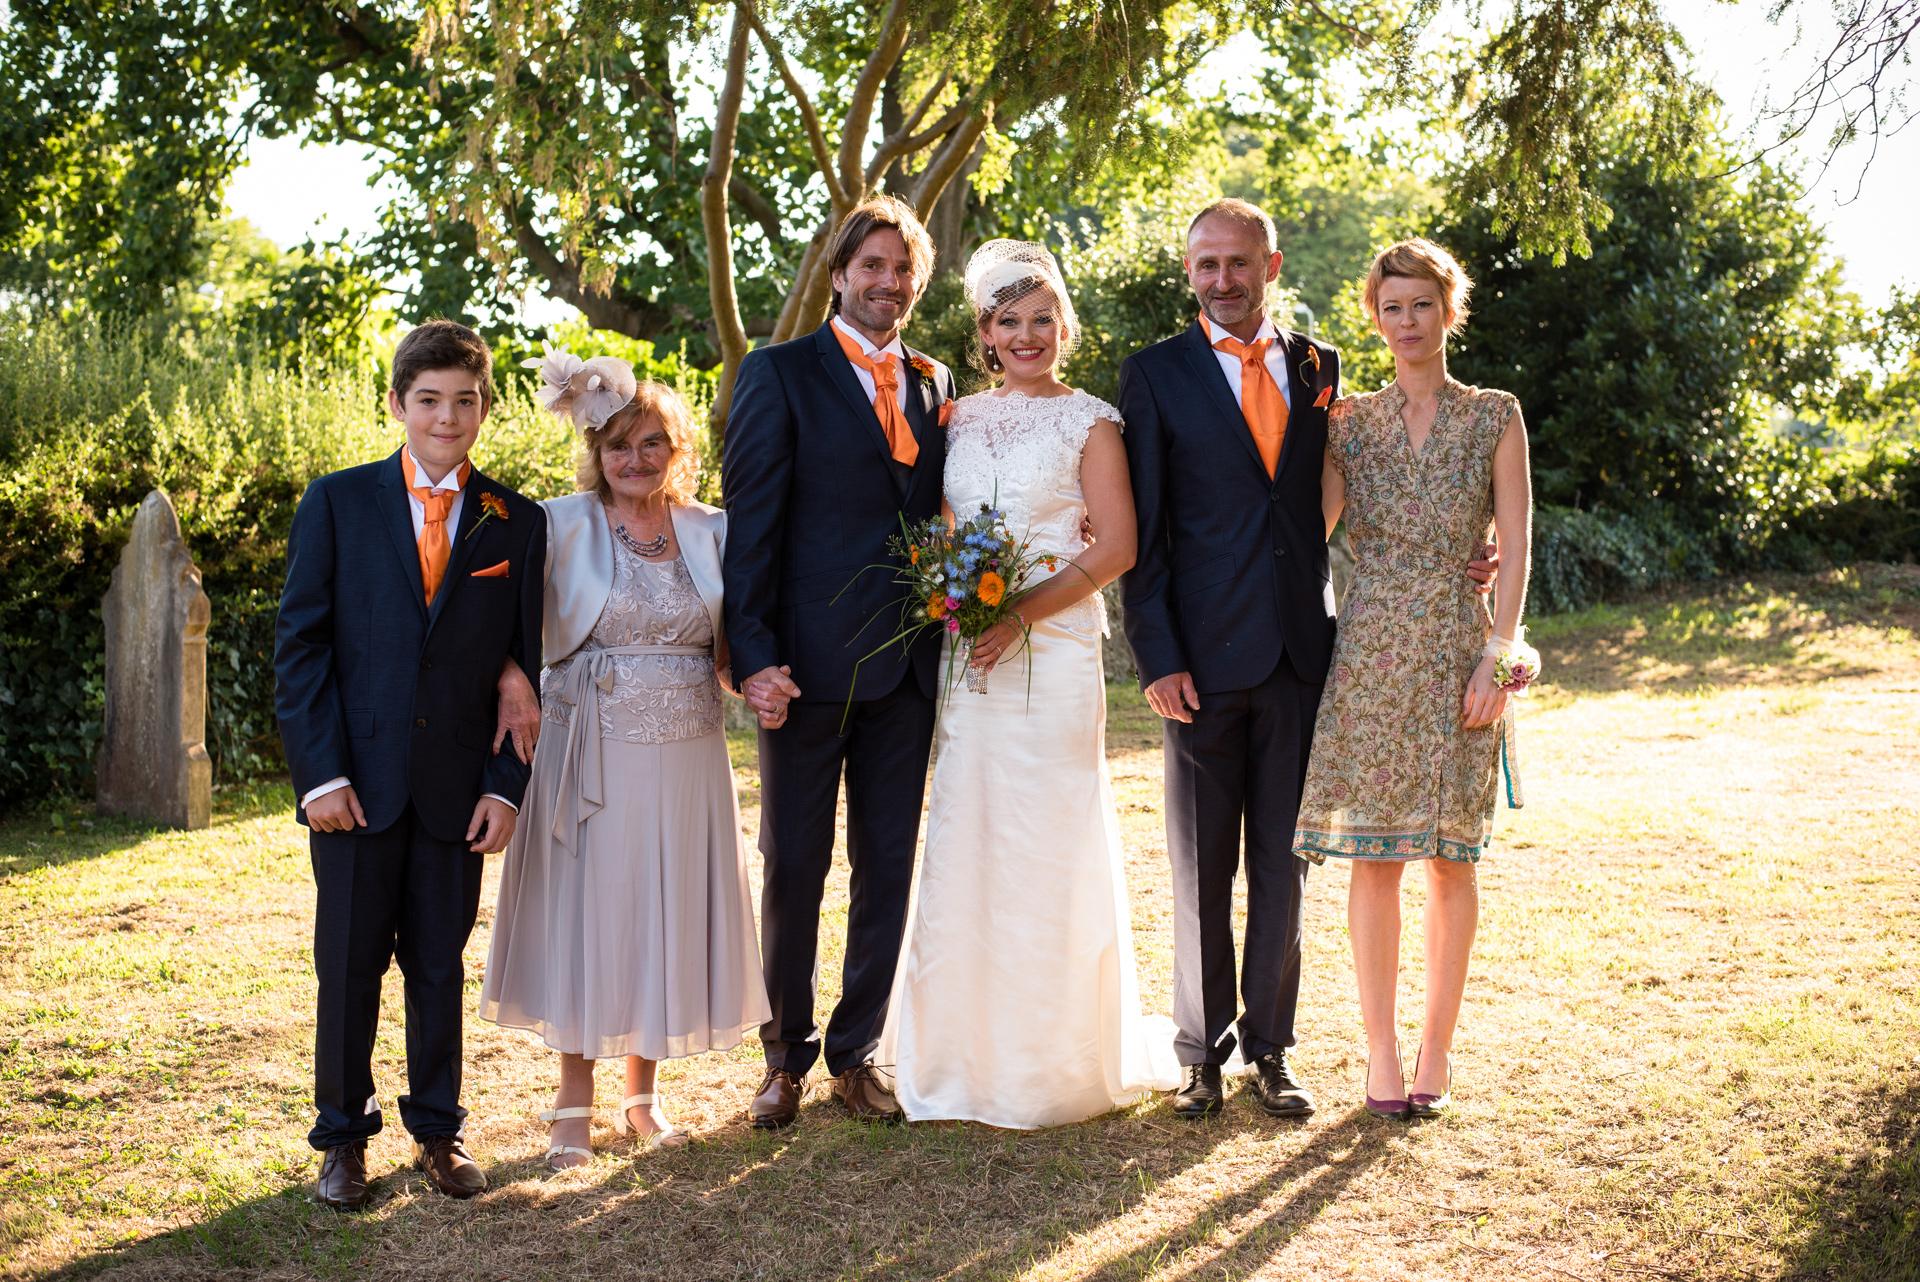 2018 Wedding Photography Prices